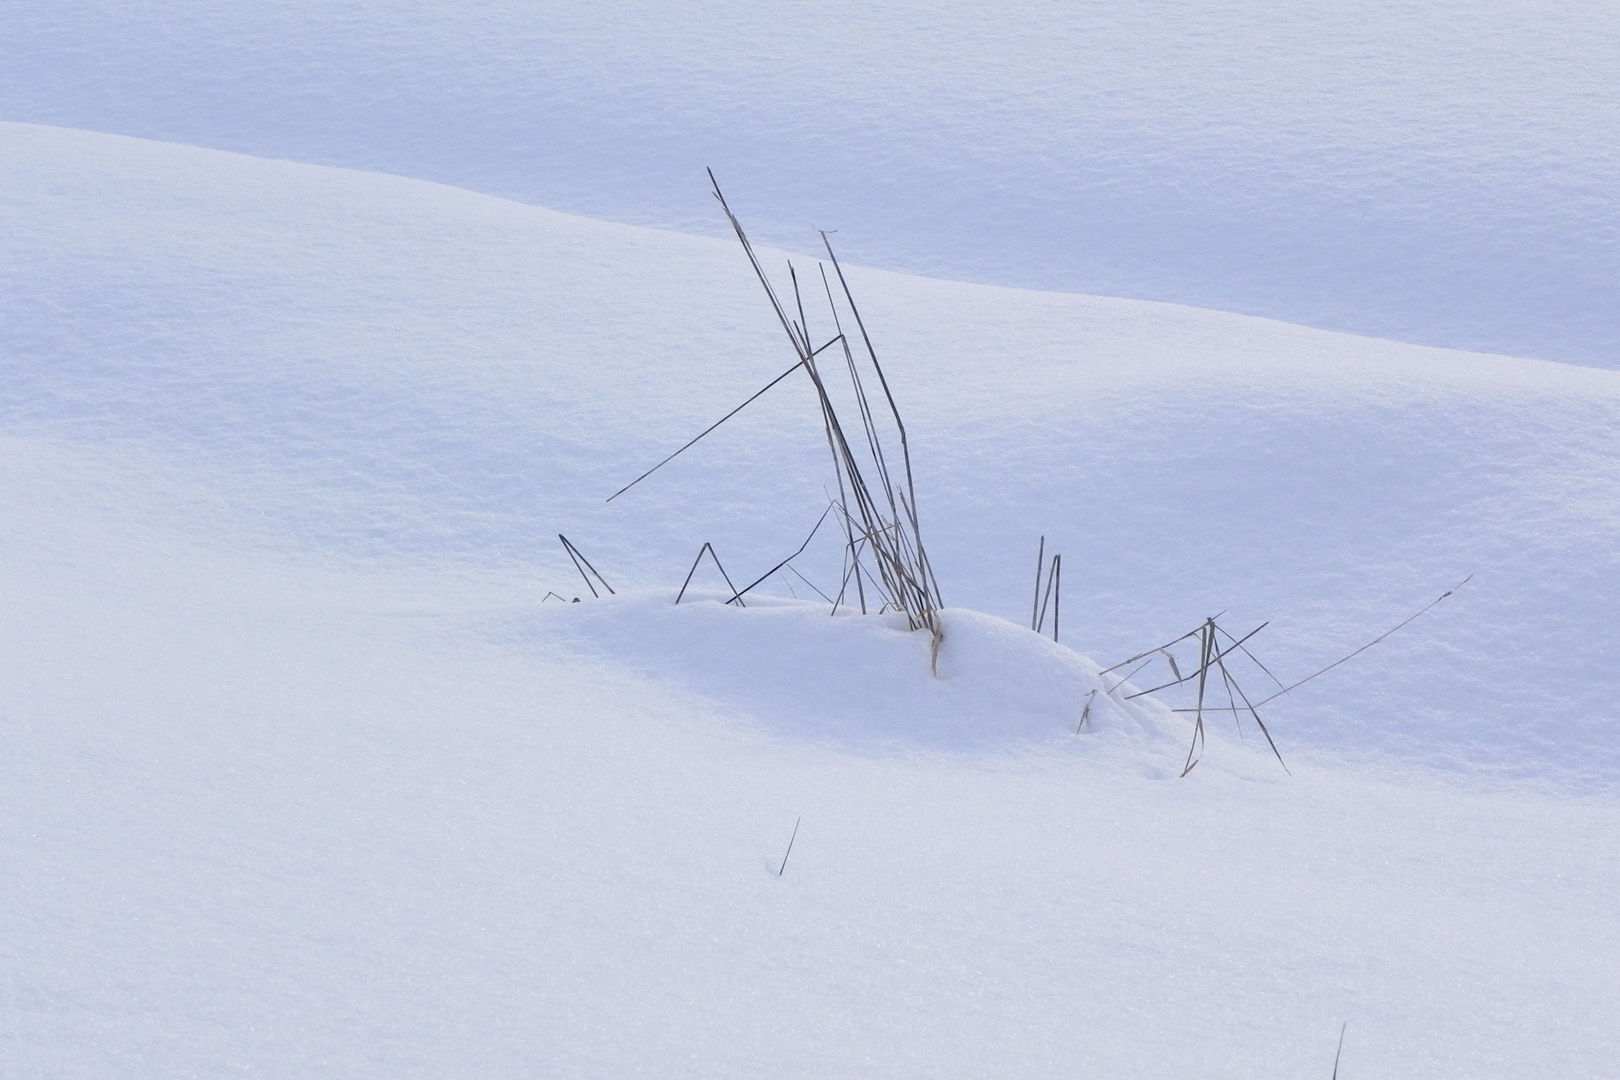 Brin d'herbe sous la neige